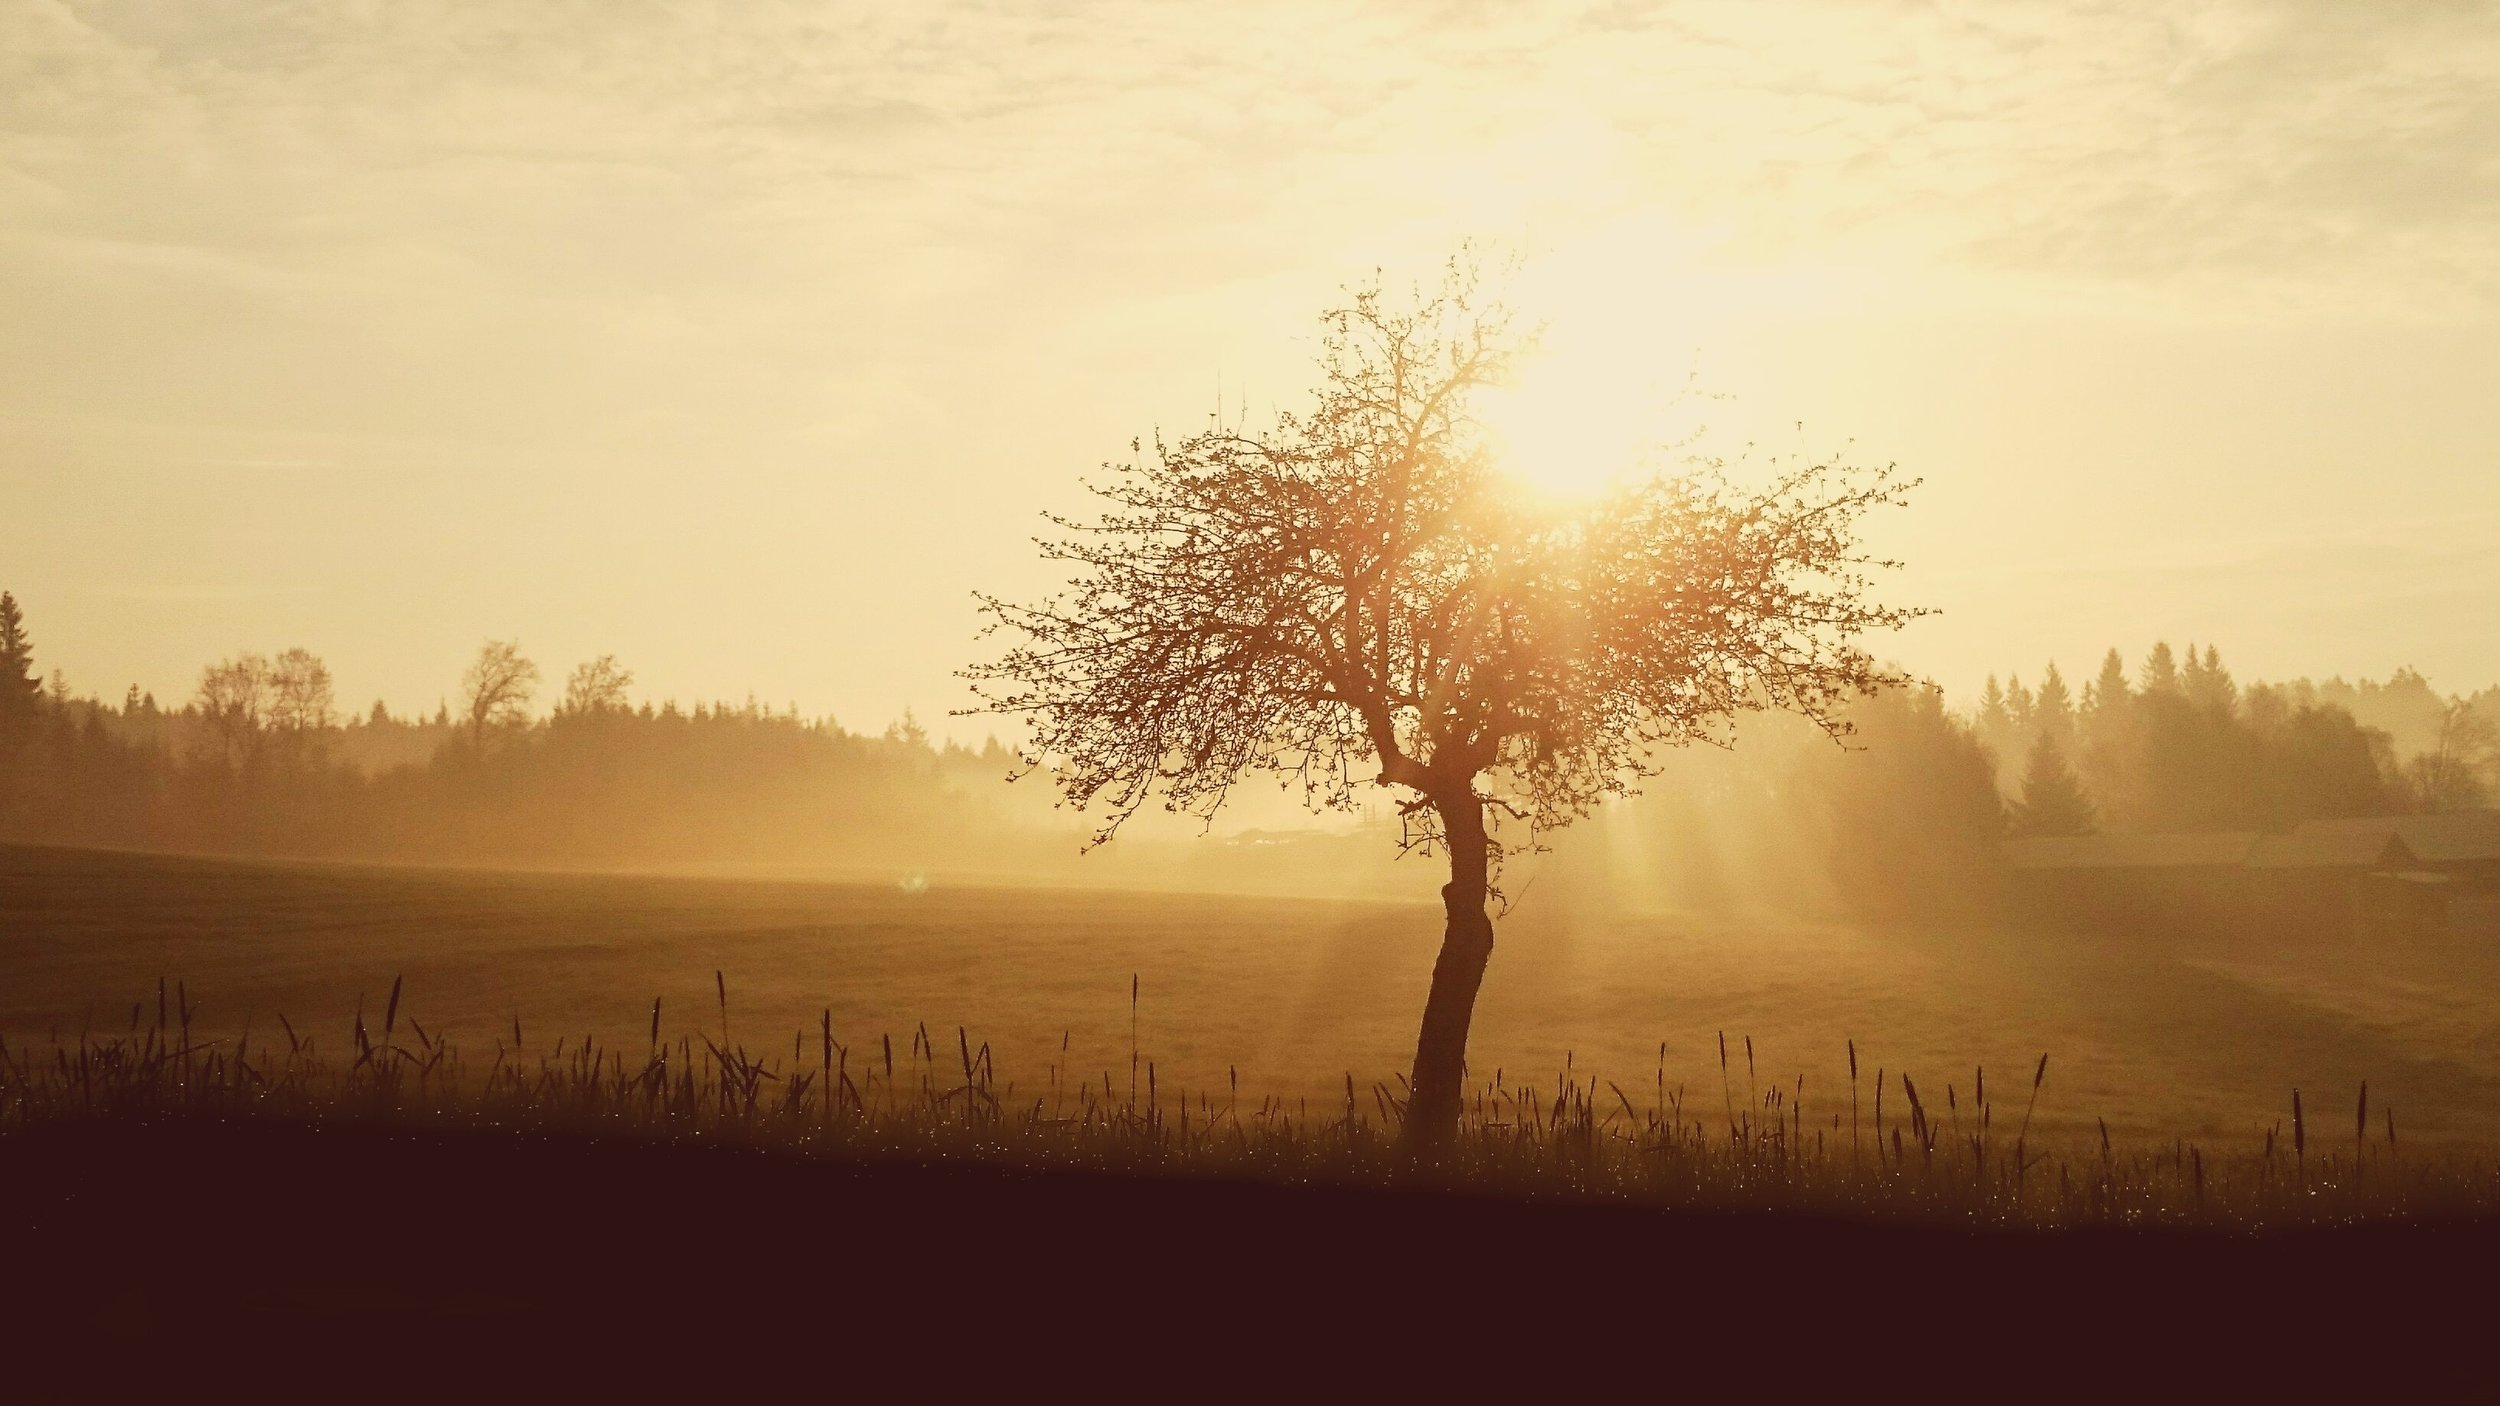 countryside-dark-dawn-163391.jpg